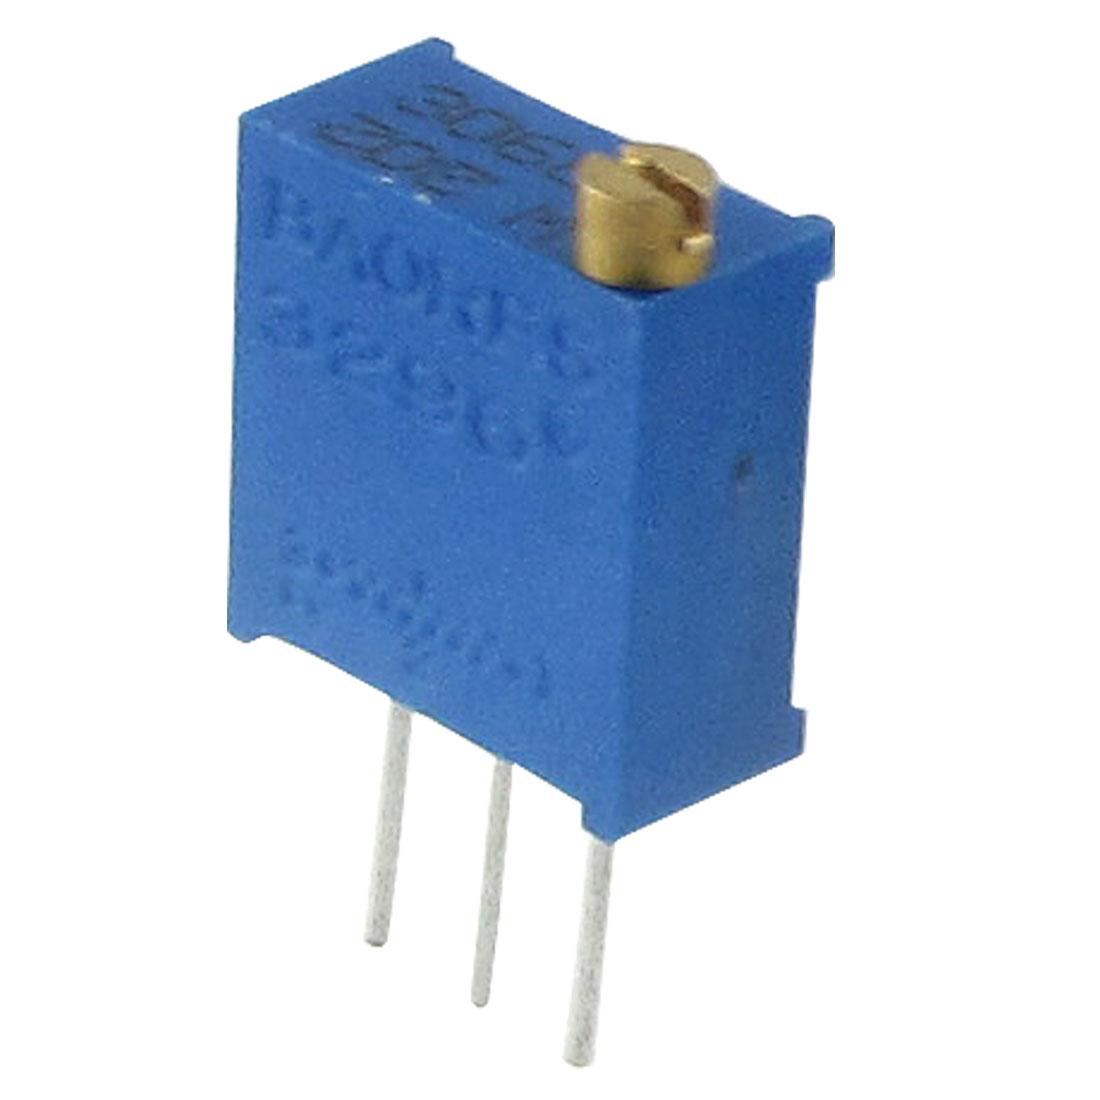 2K Ohm 3296 Square Cermet Trim Pot Trimmer Potentiometer 5 Pcs